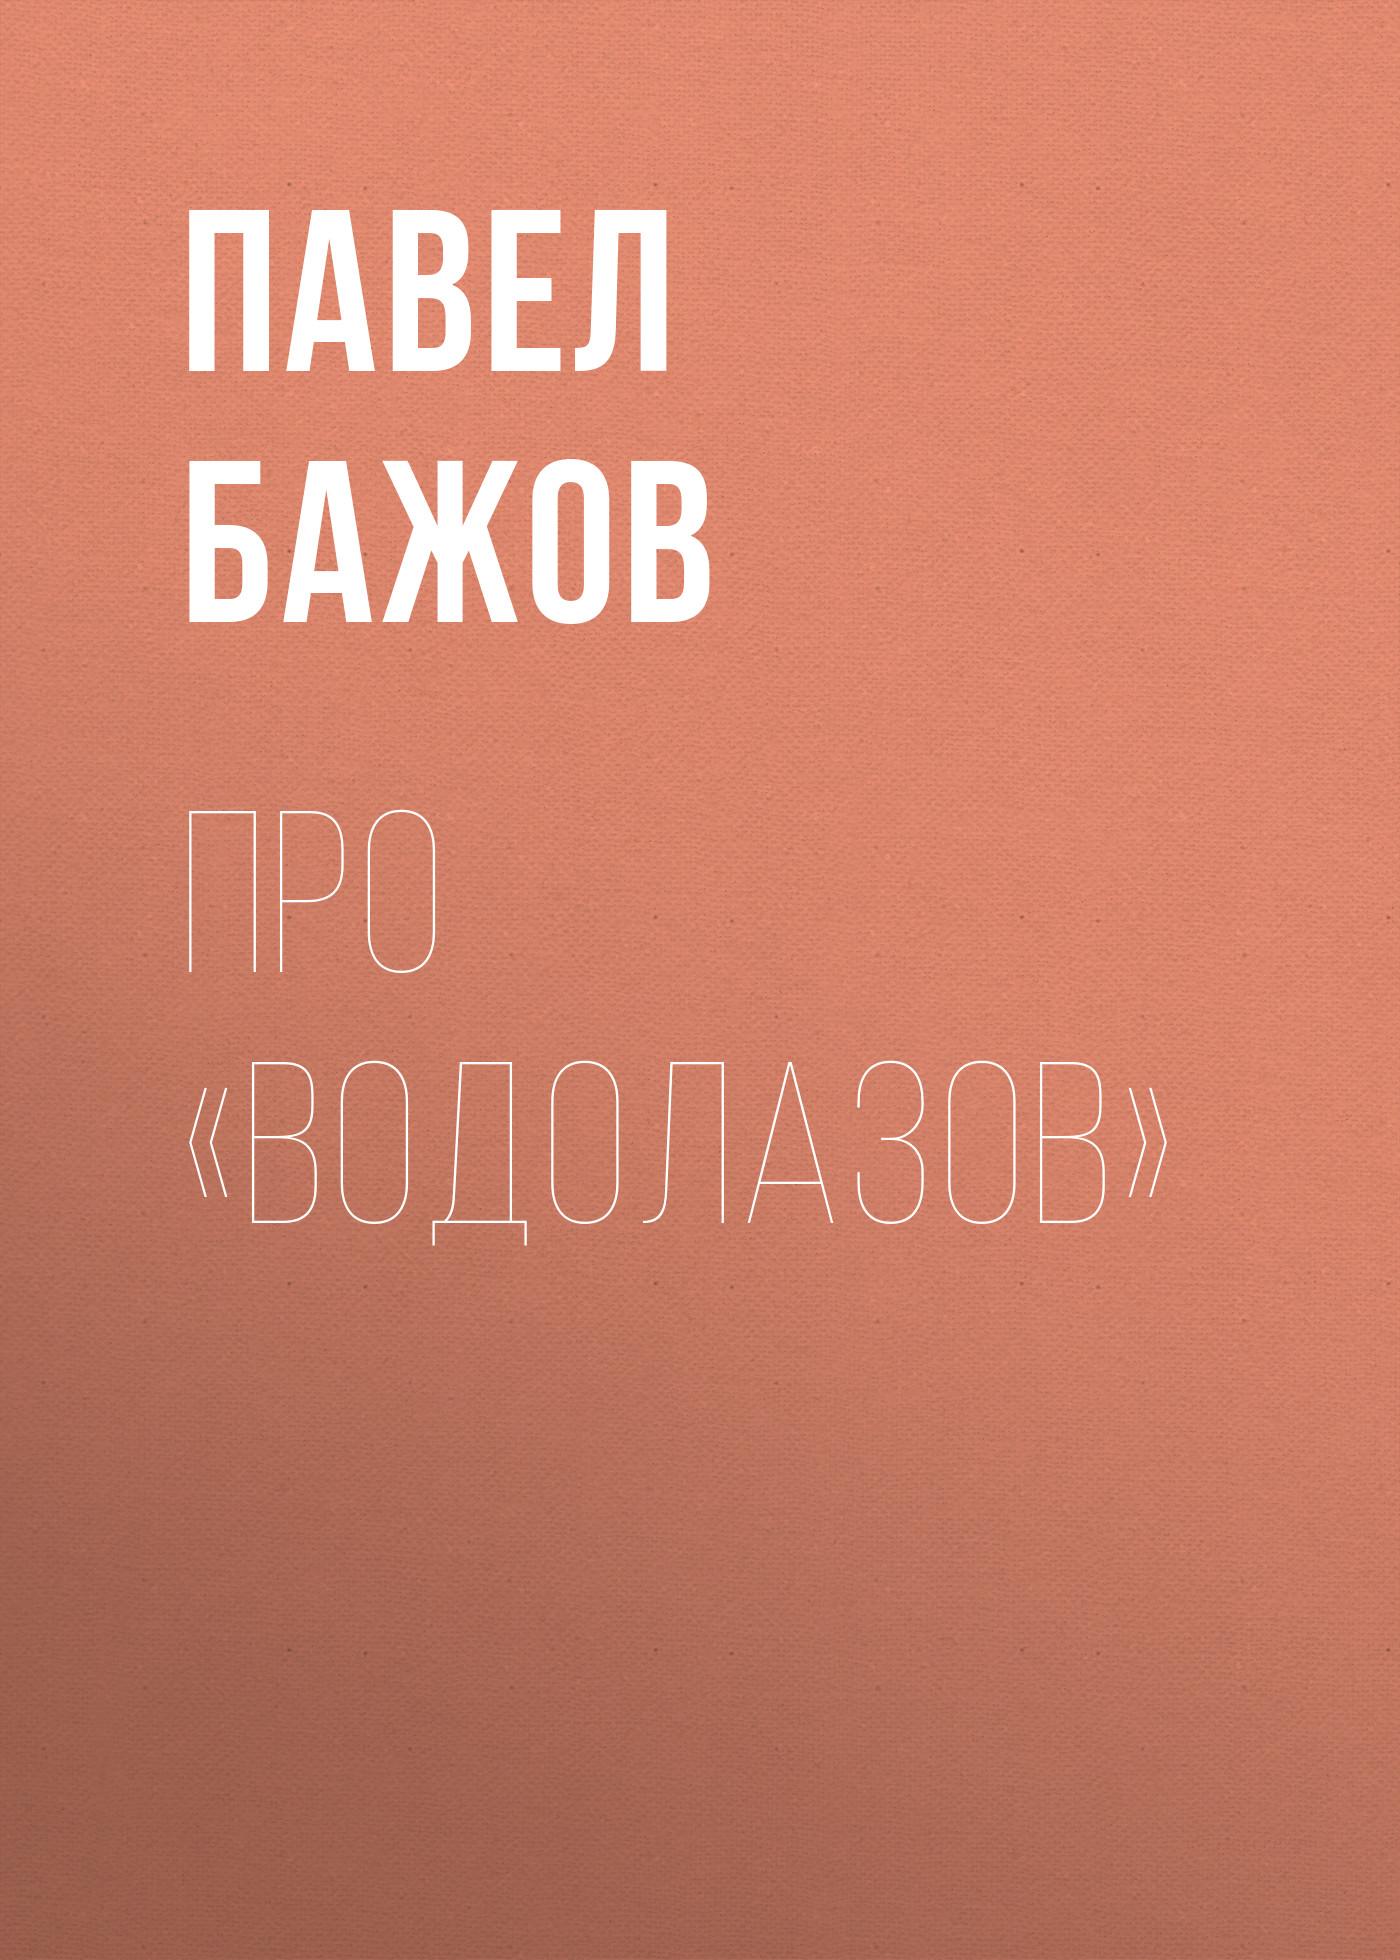 Купить книгу Про «водолазов», автора Павла Бажова